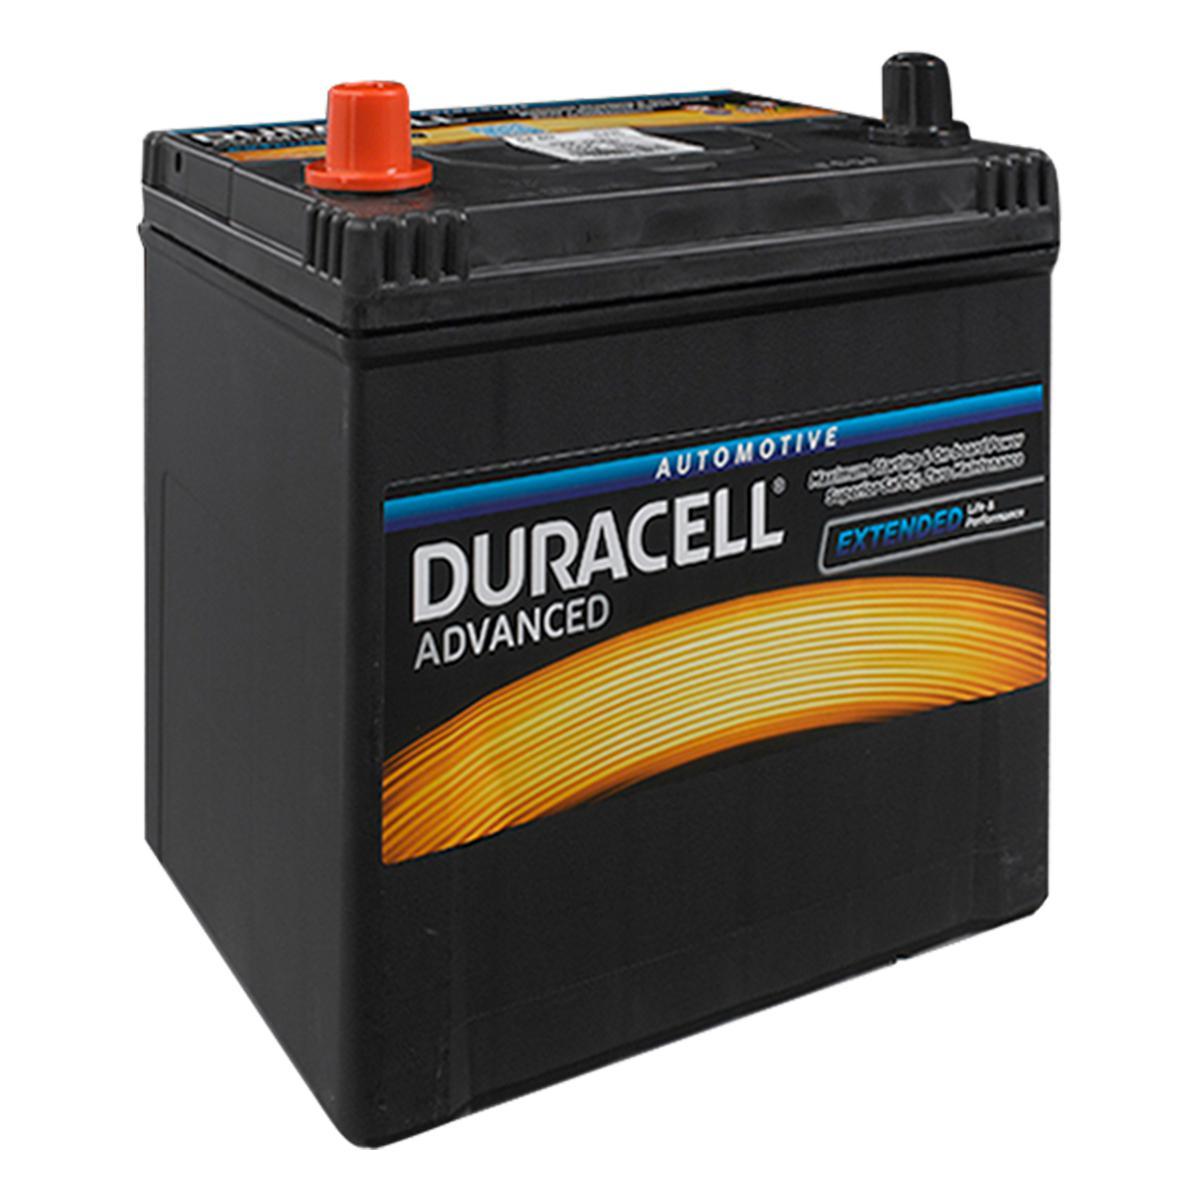 Duracell Car Battery R